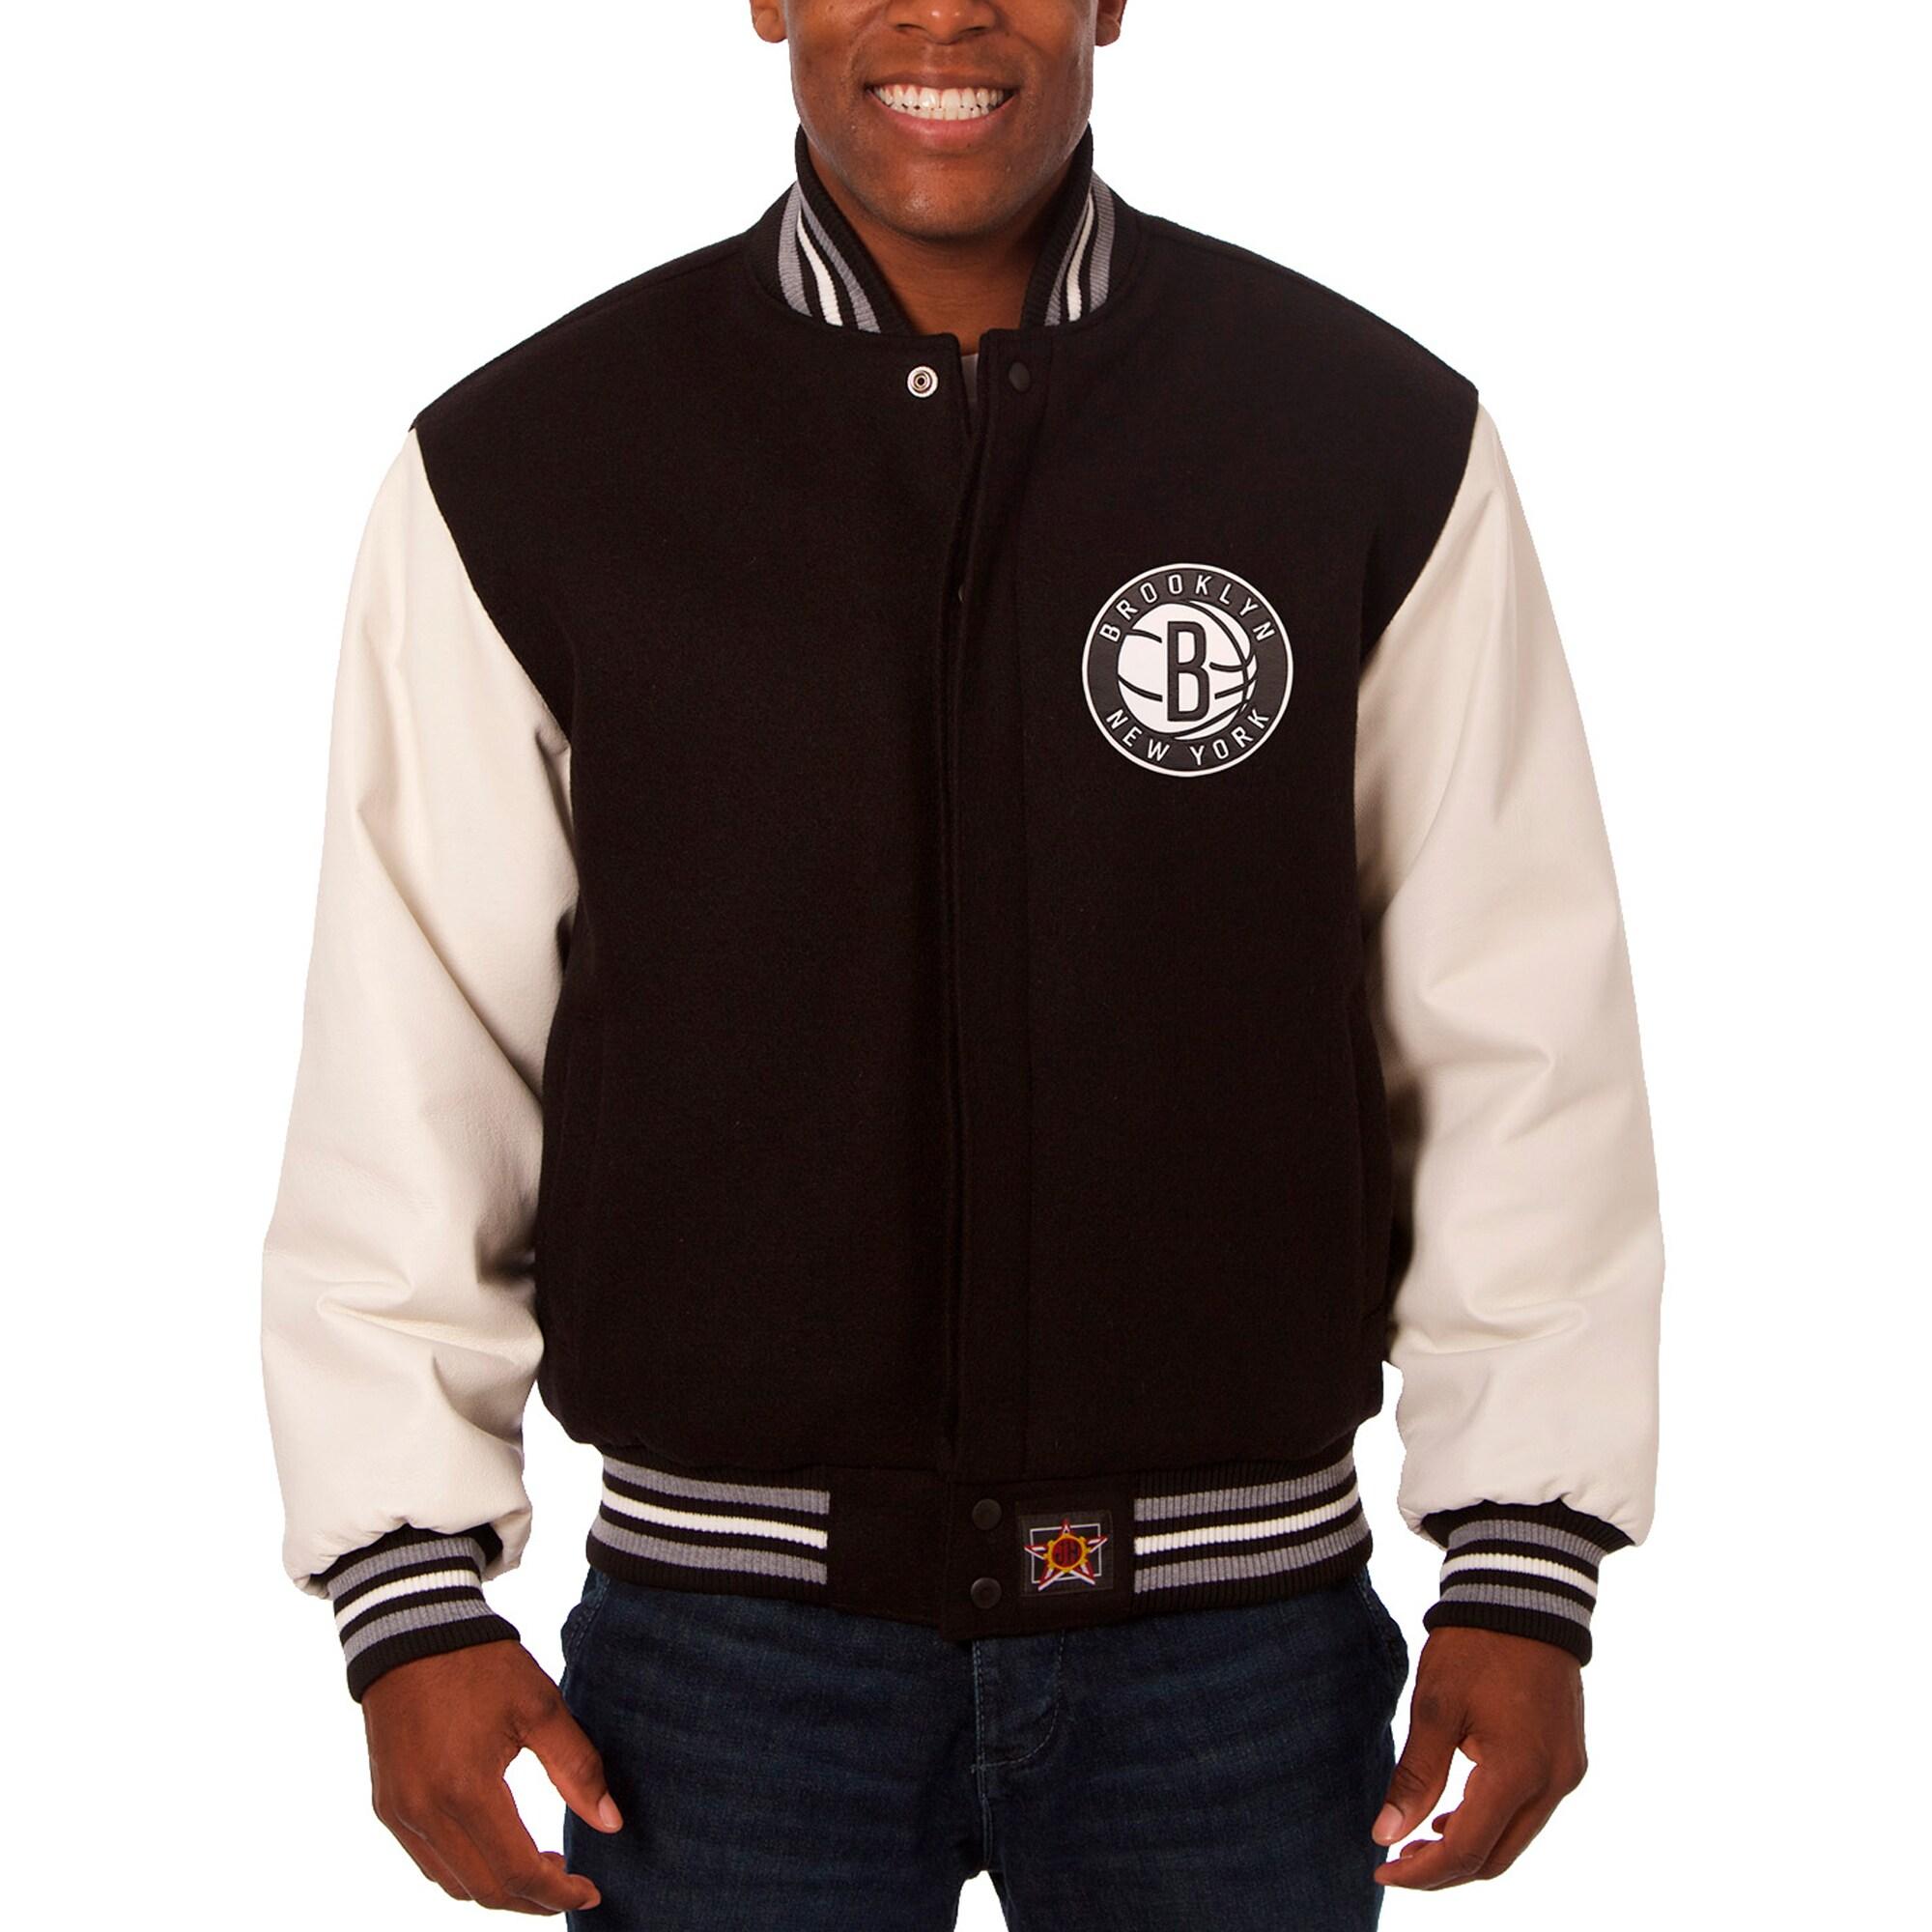 Brooklyn Nets JH Design Big & Tall Wool & Leather Full-Snap Jacket - Black/White